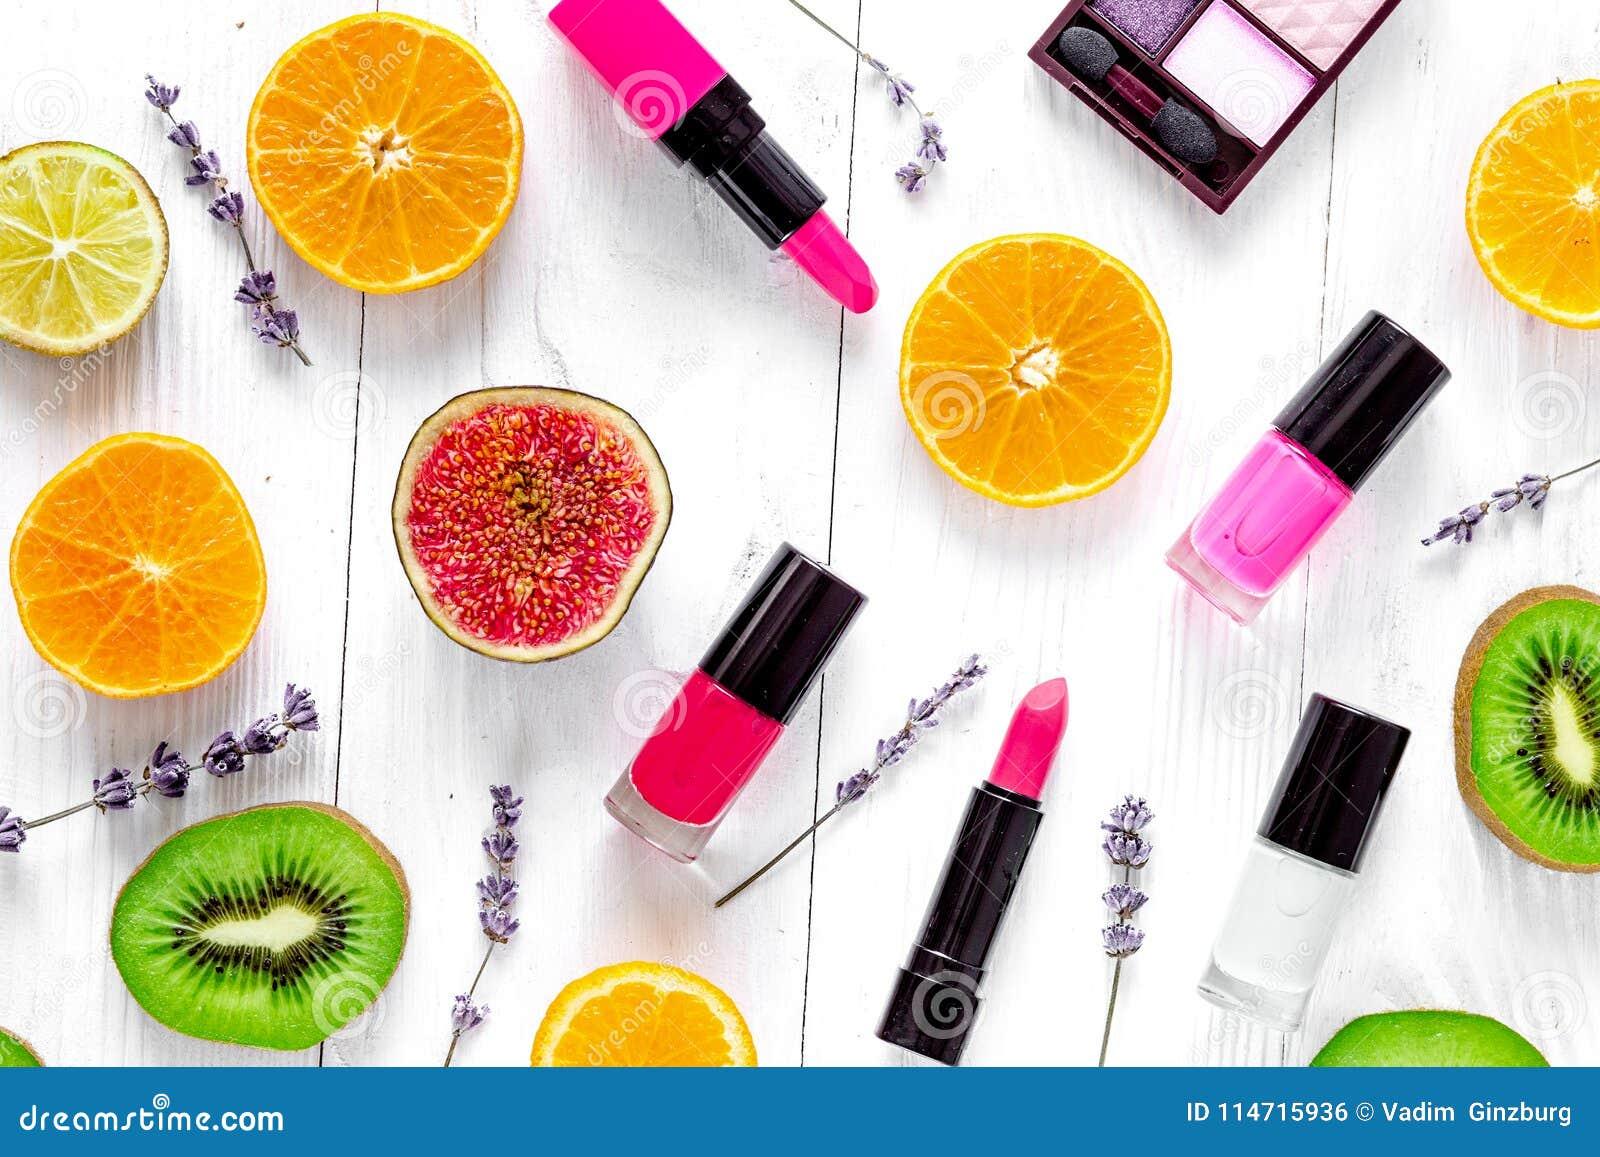 Fruit pattern with lipstick and nailpolish on white desk backgro